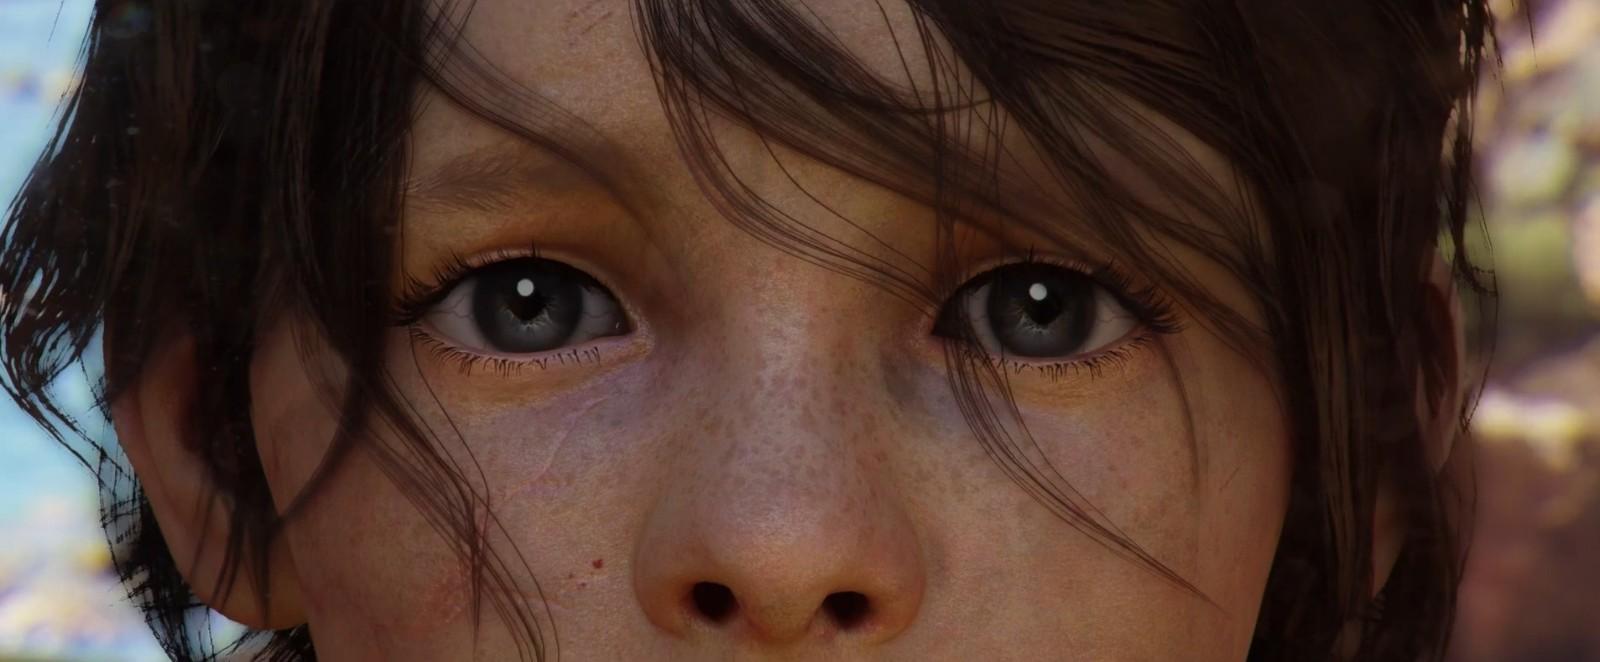 E3 2021:《瘟疫傳說》續作《瘟疫傳說:安魂曲》預告